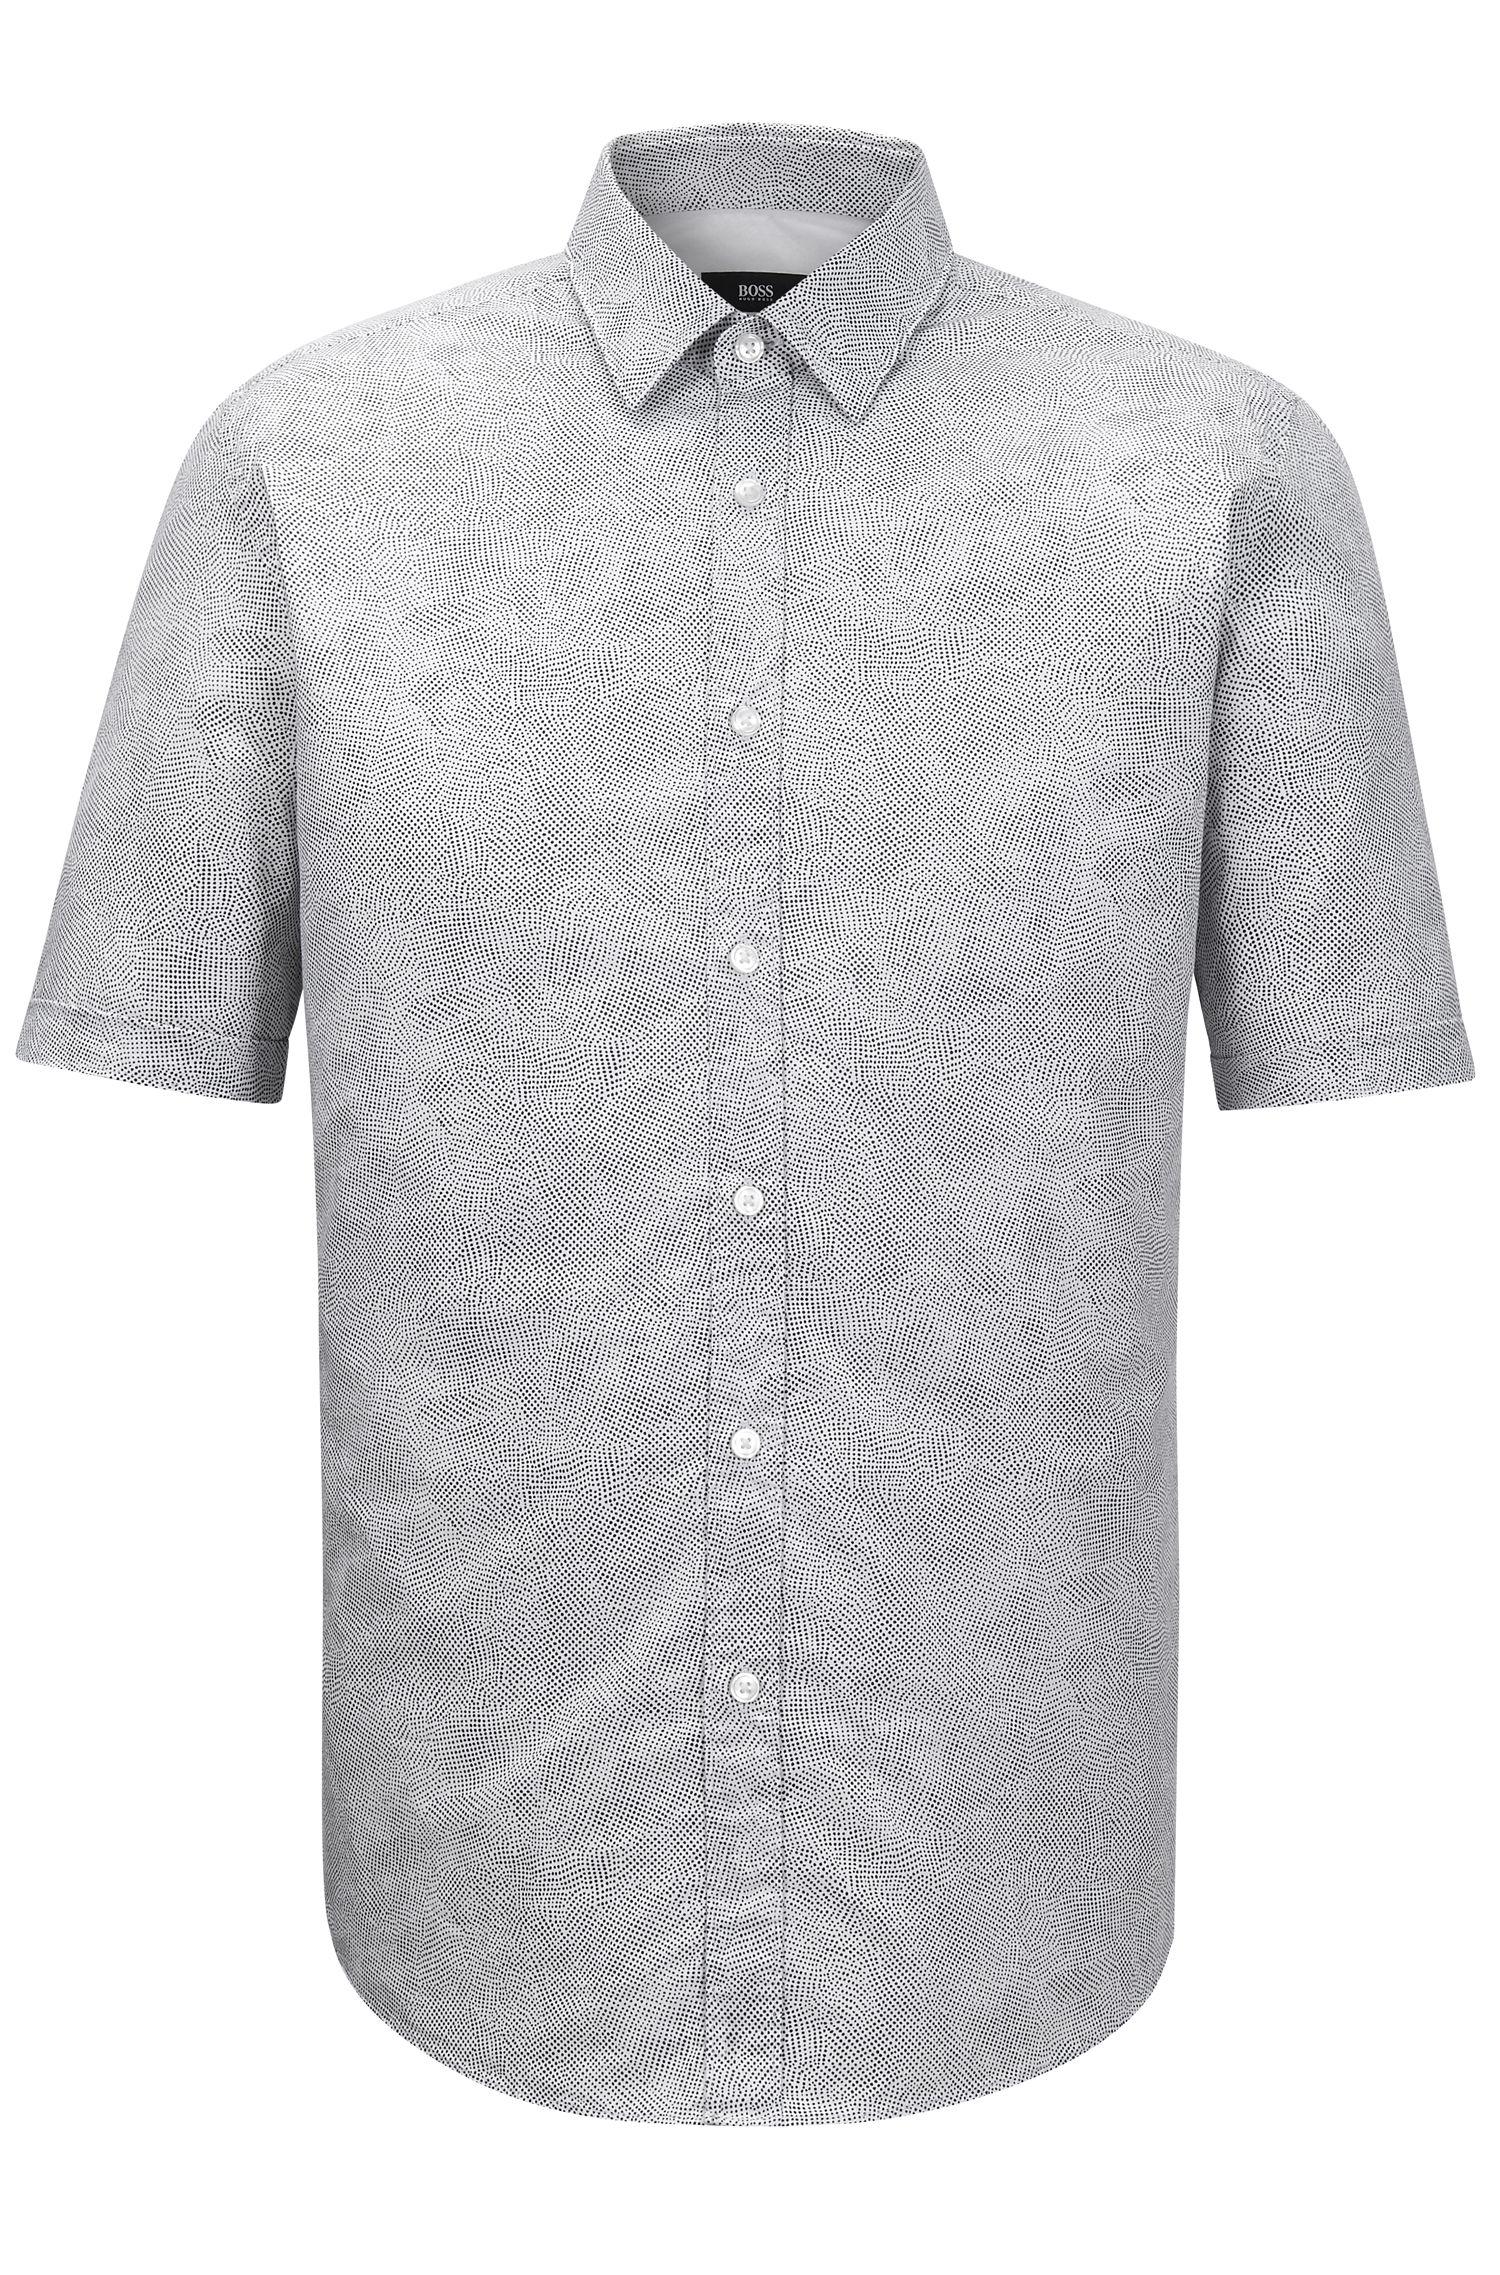 'Luka'   Regular Fit, Stretch Cotton Button Down Shirt